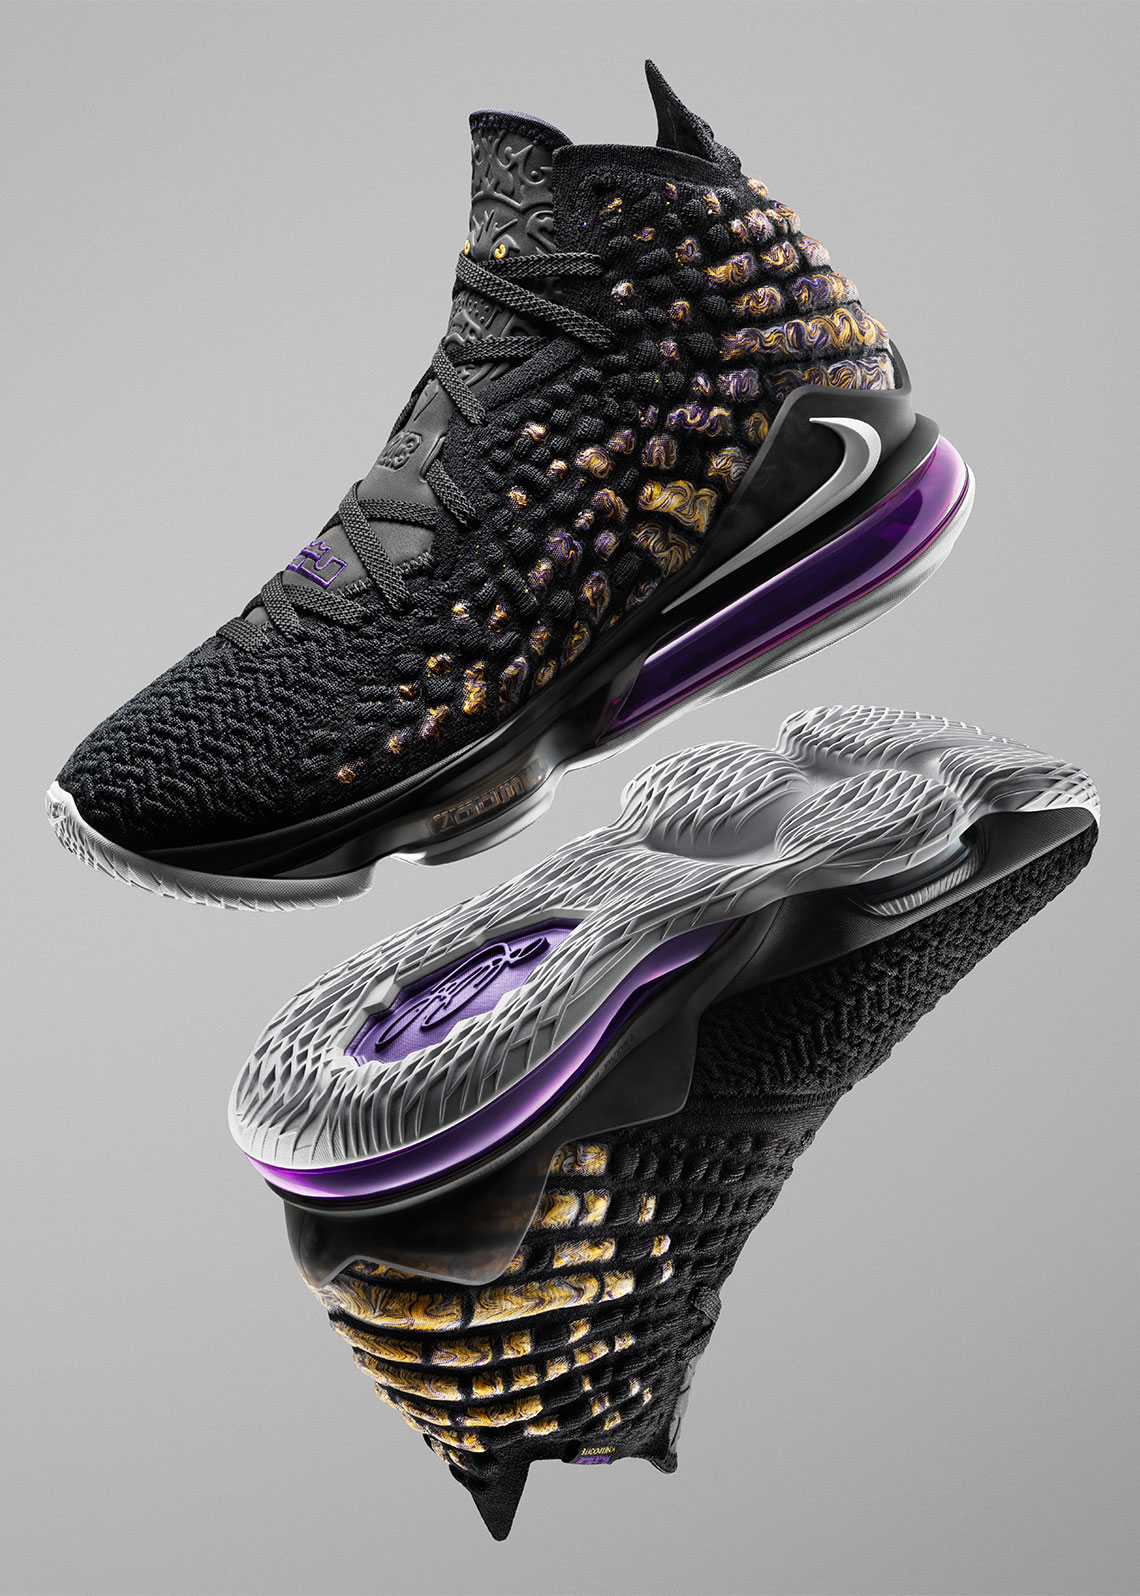 estómago perdí mi camino este  Nike LeBron 17 Lakers Purple Yellow | SneakerNews.com